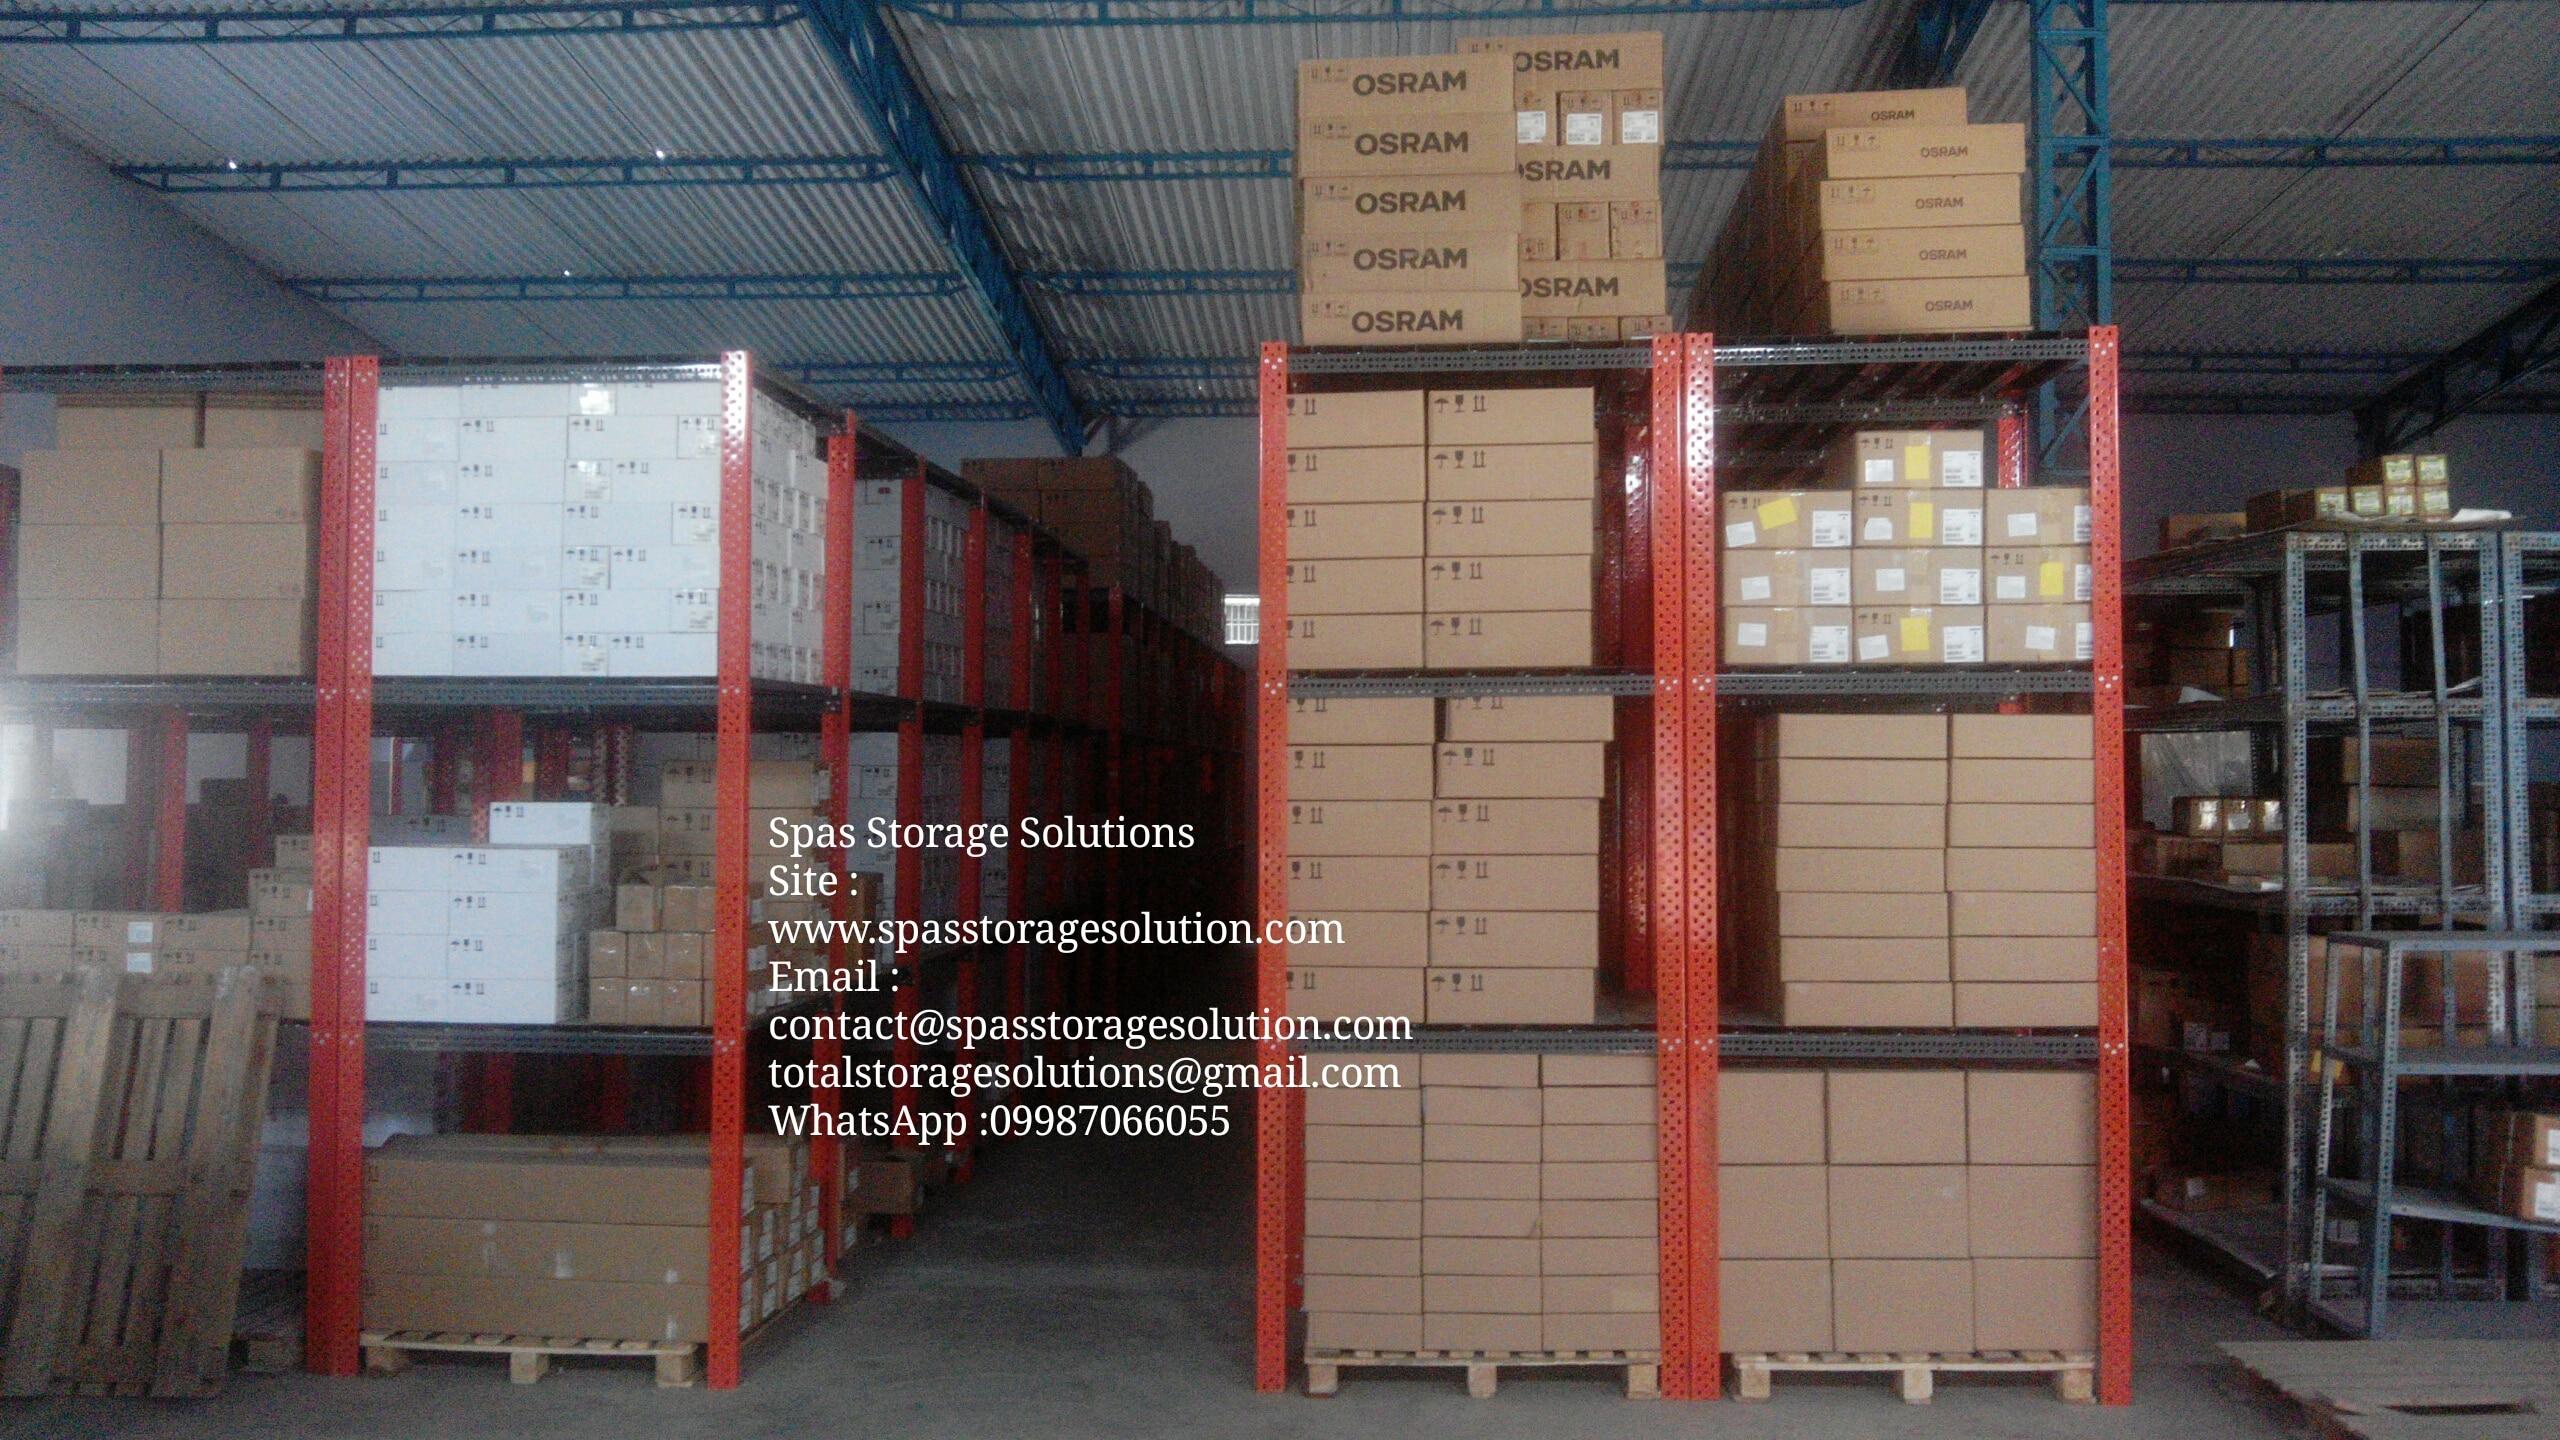 Spas Storage Solutions